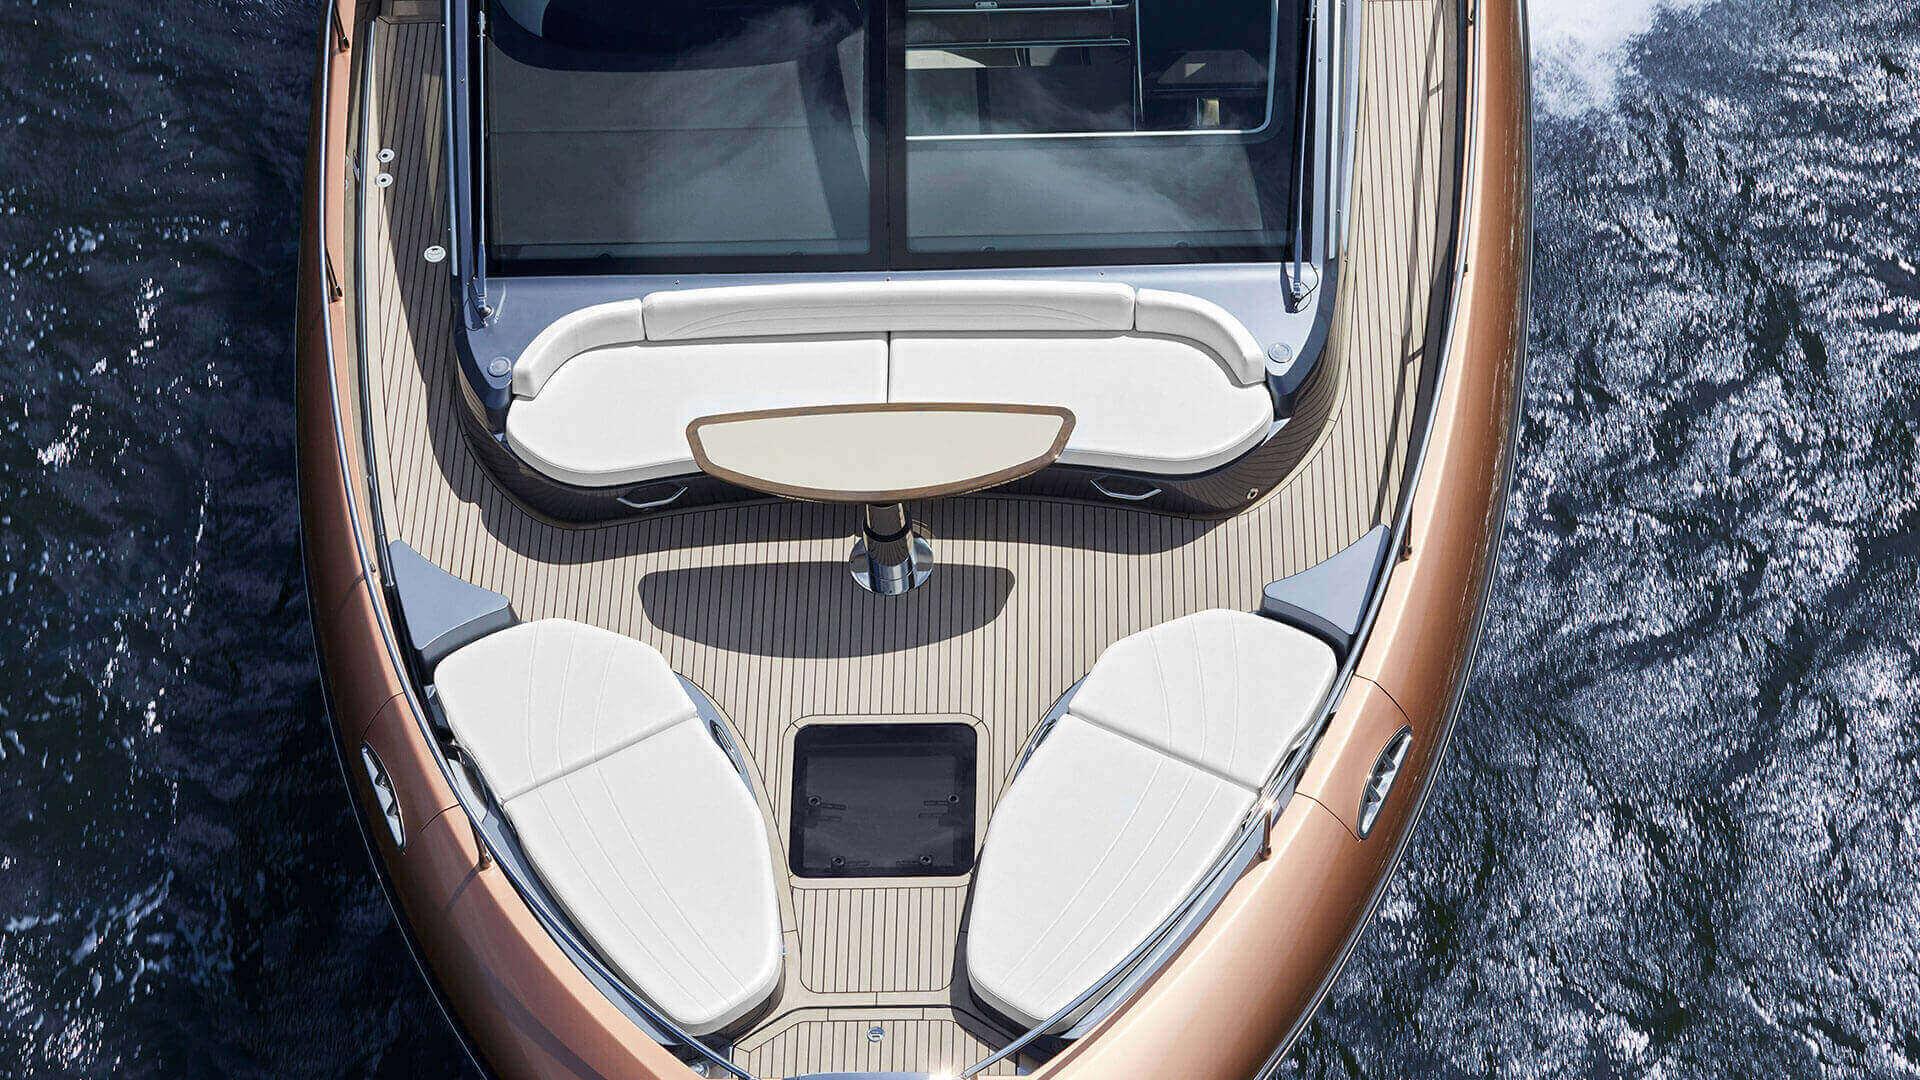 2020 lexus yacht ly 650 premiere gallery 06